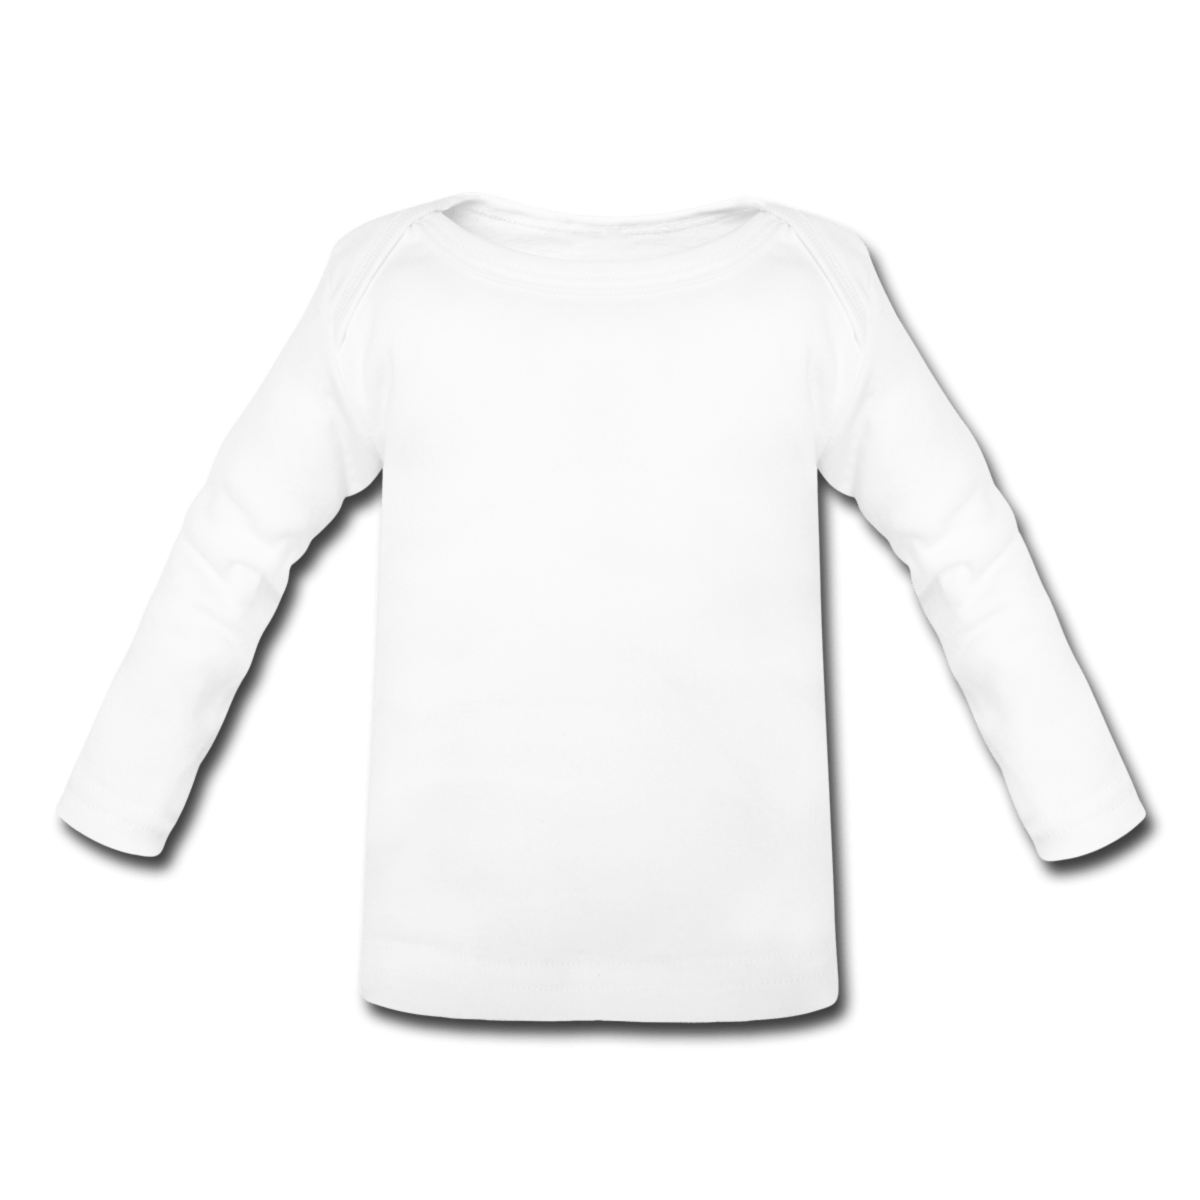 Baby T Shirt Template